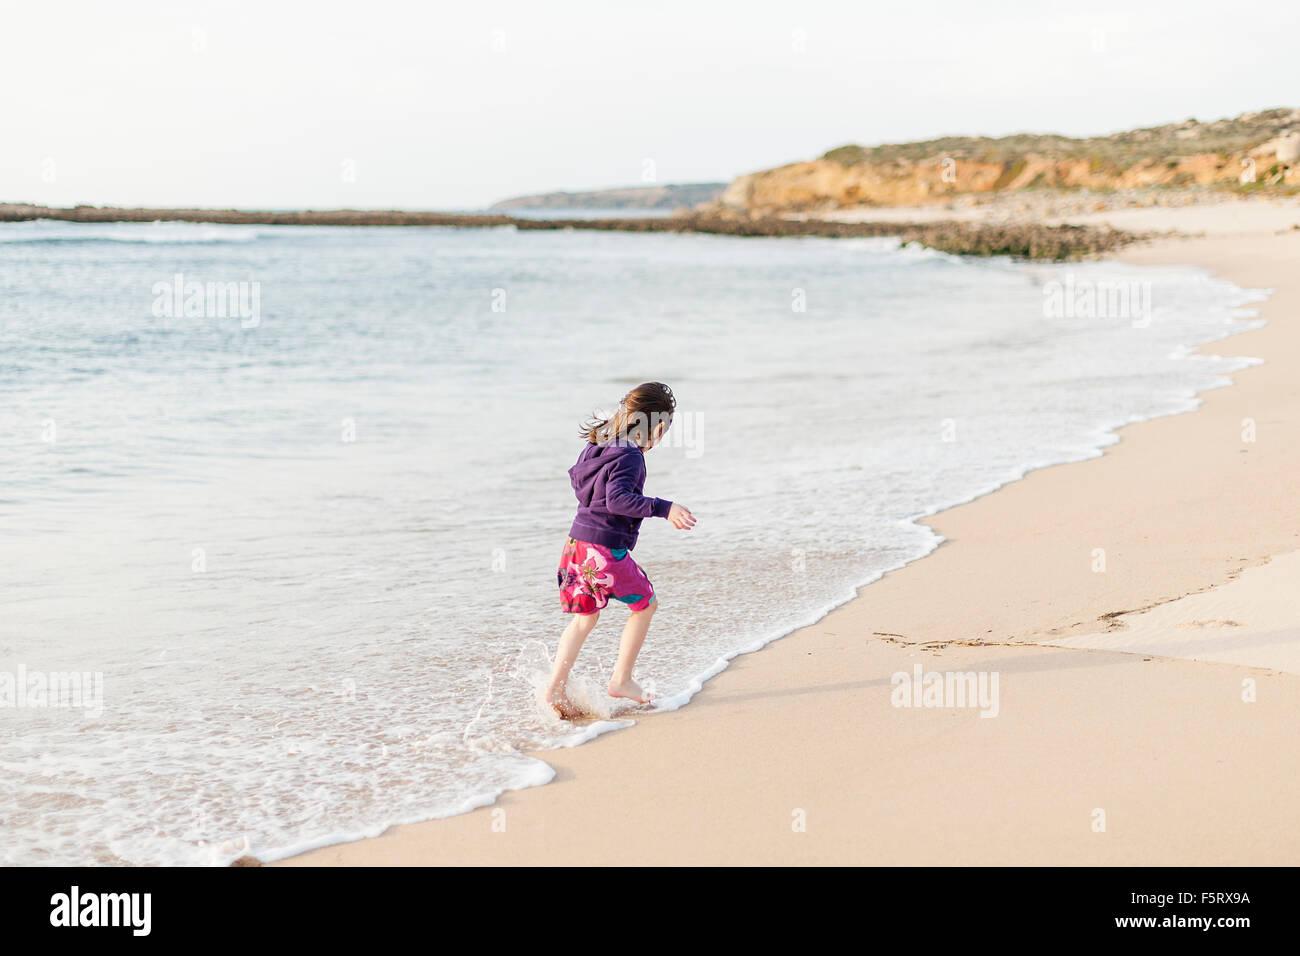 Portugal, Alentejo, Vila Nova de Milfontes, Girl (4-5) running in surf - Stock Image